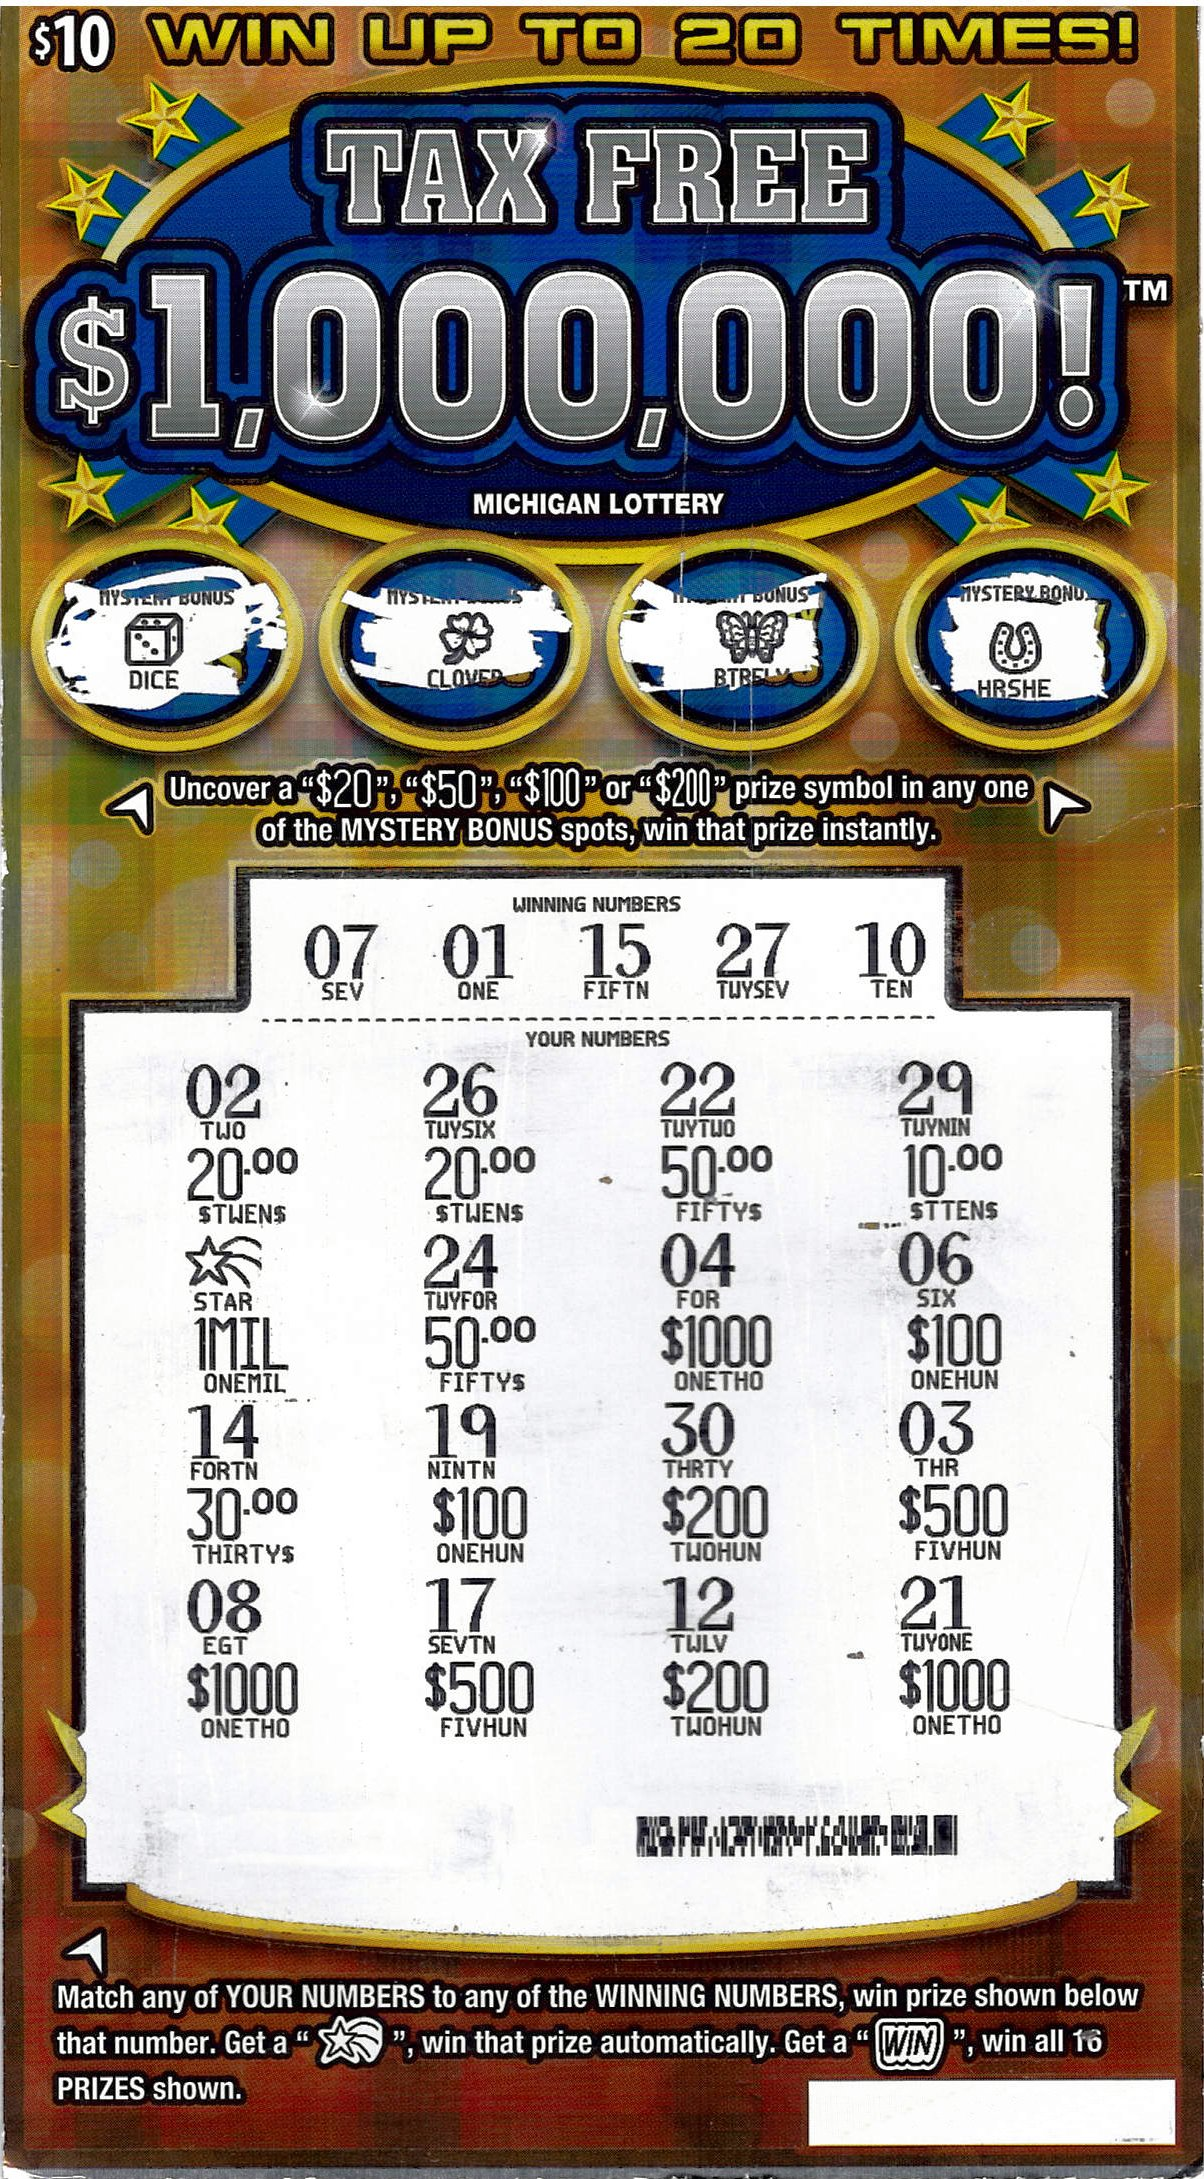 Grand Rapids Woman Wins $1 Million Playing the Michigan Lottery's